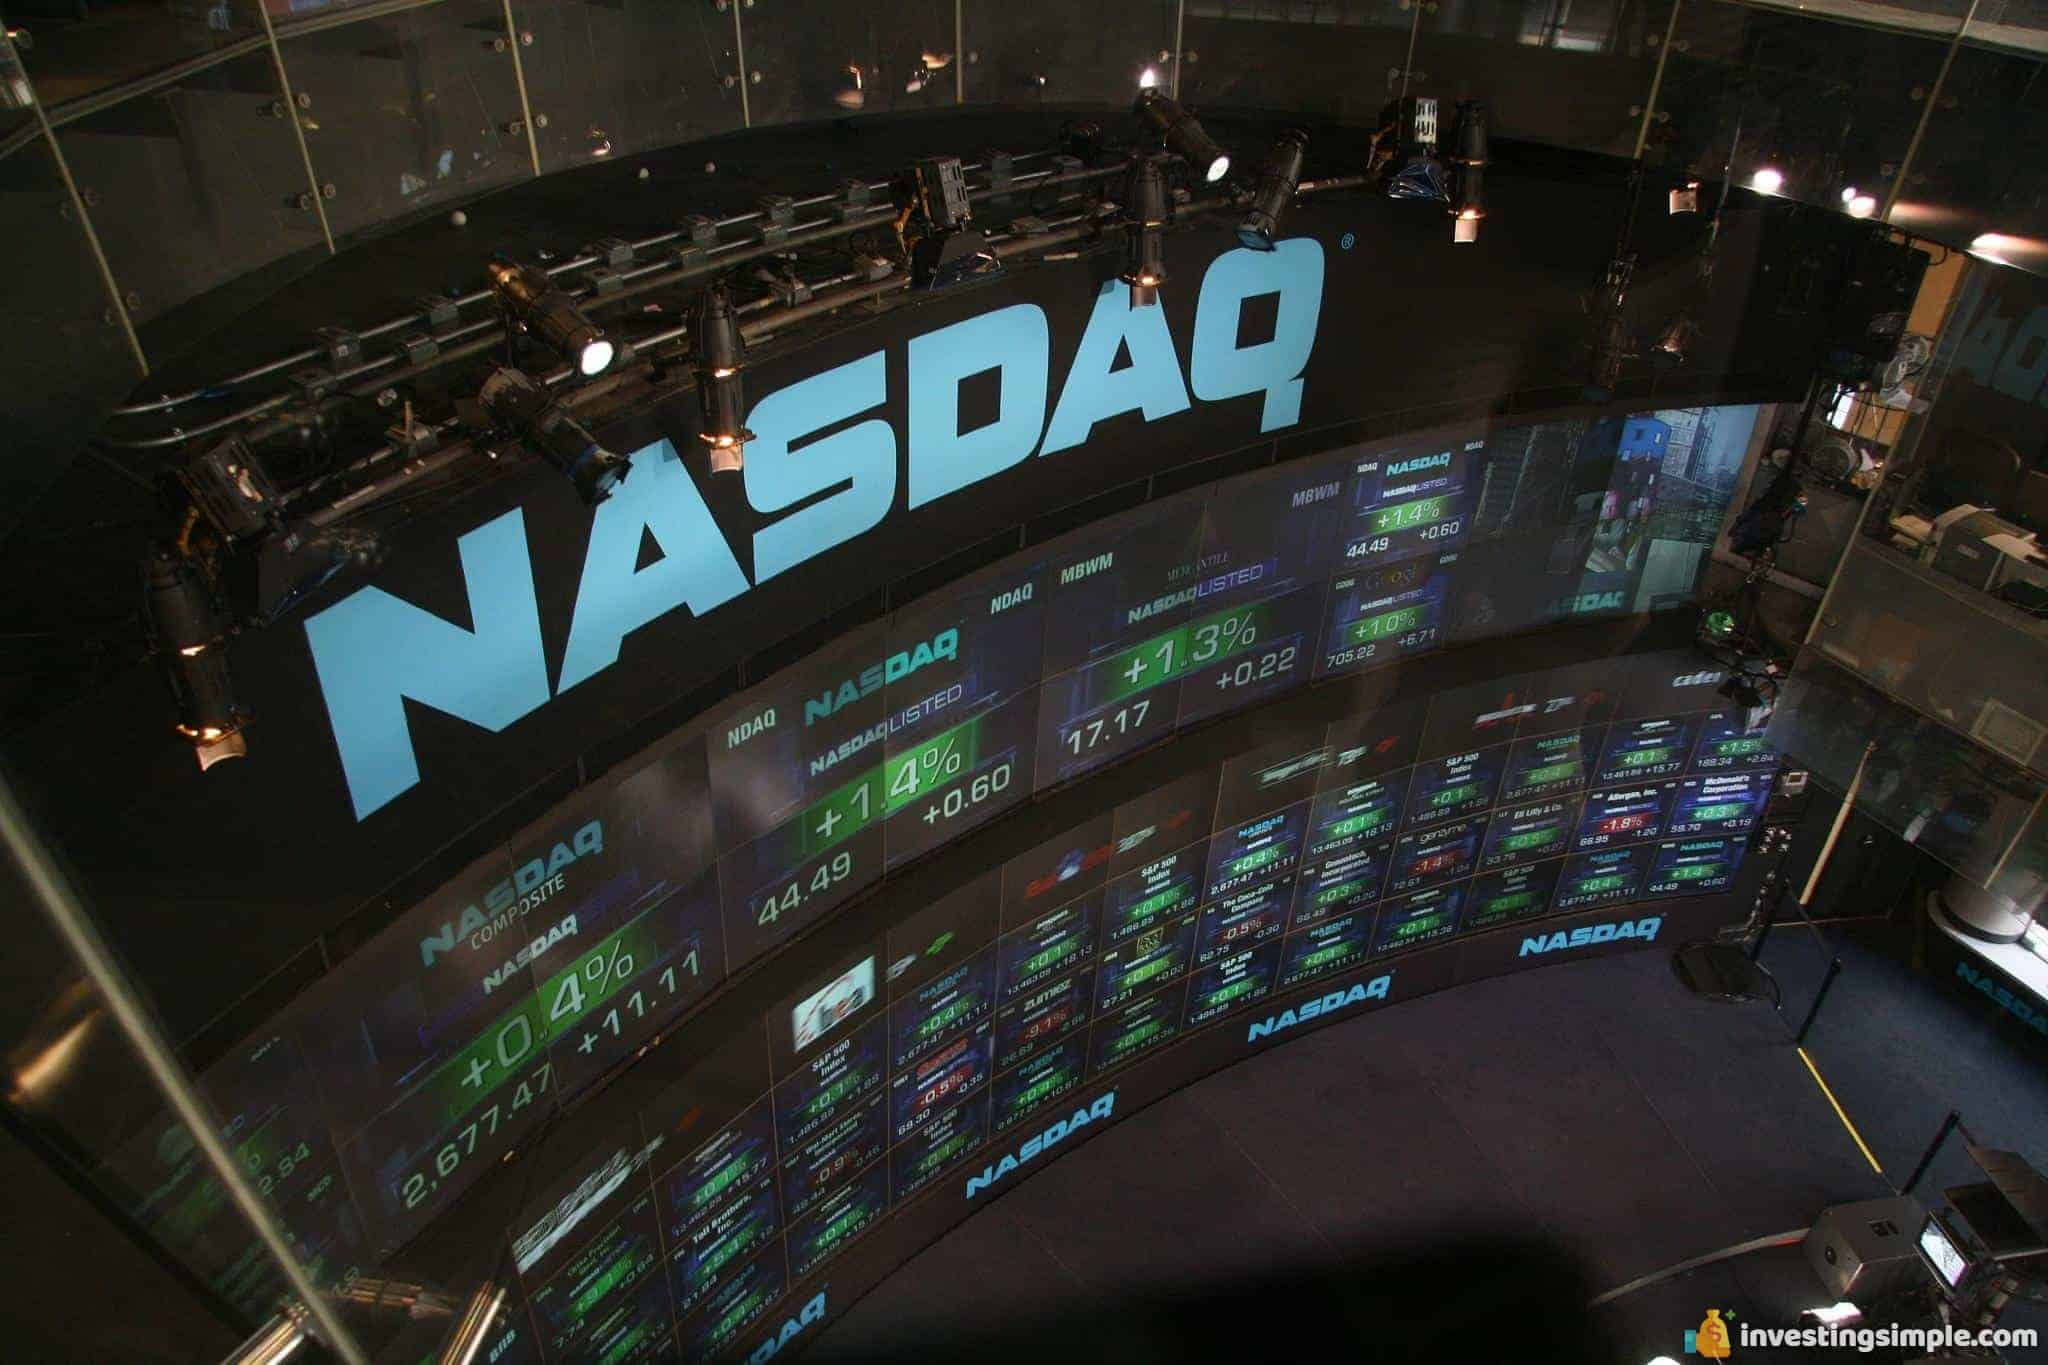 NASDAQ_stock_market_display.jpg